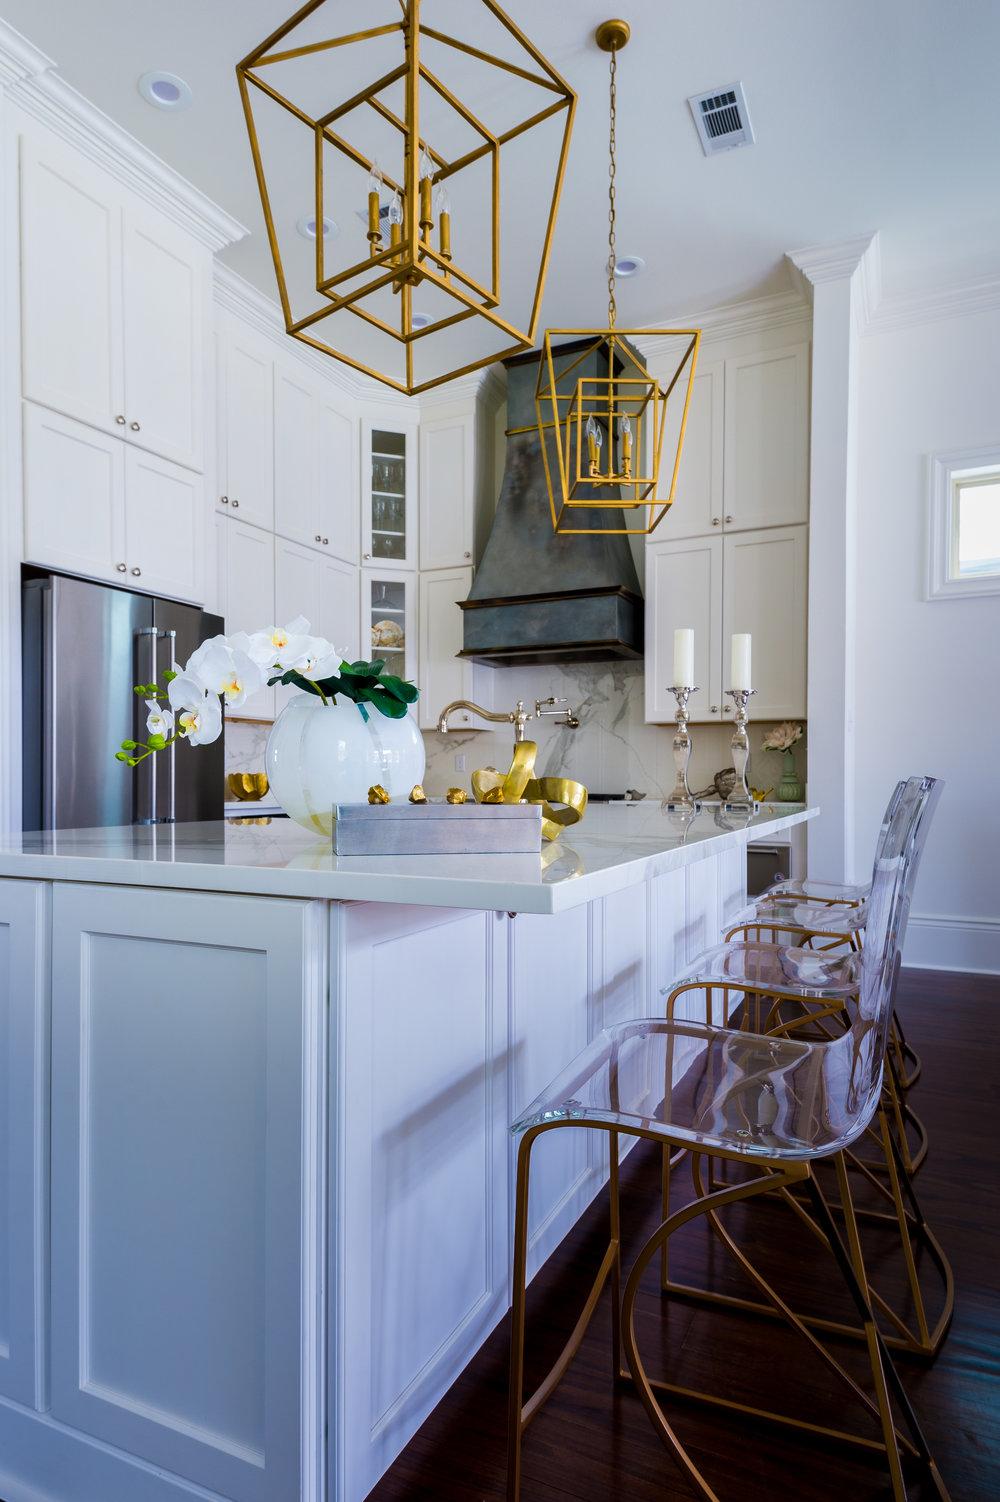 khb interiors kitchen metairie interior designer new orleans interior decorator help me furnish my home new orleans